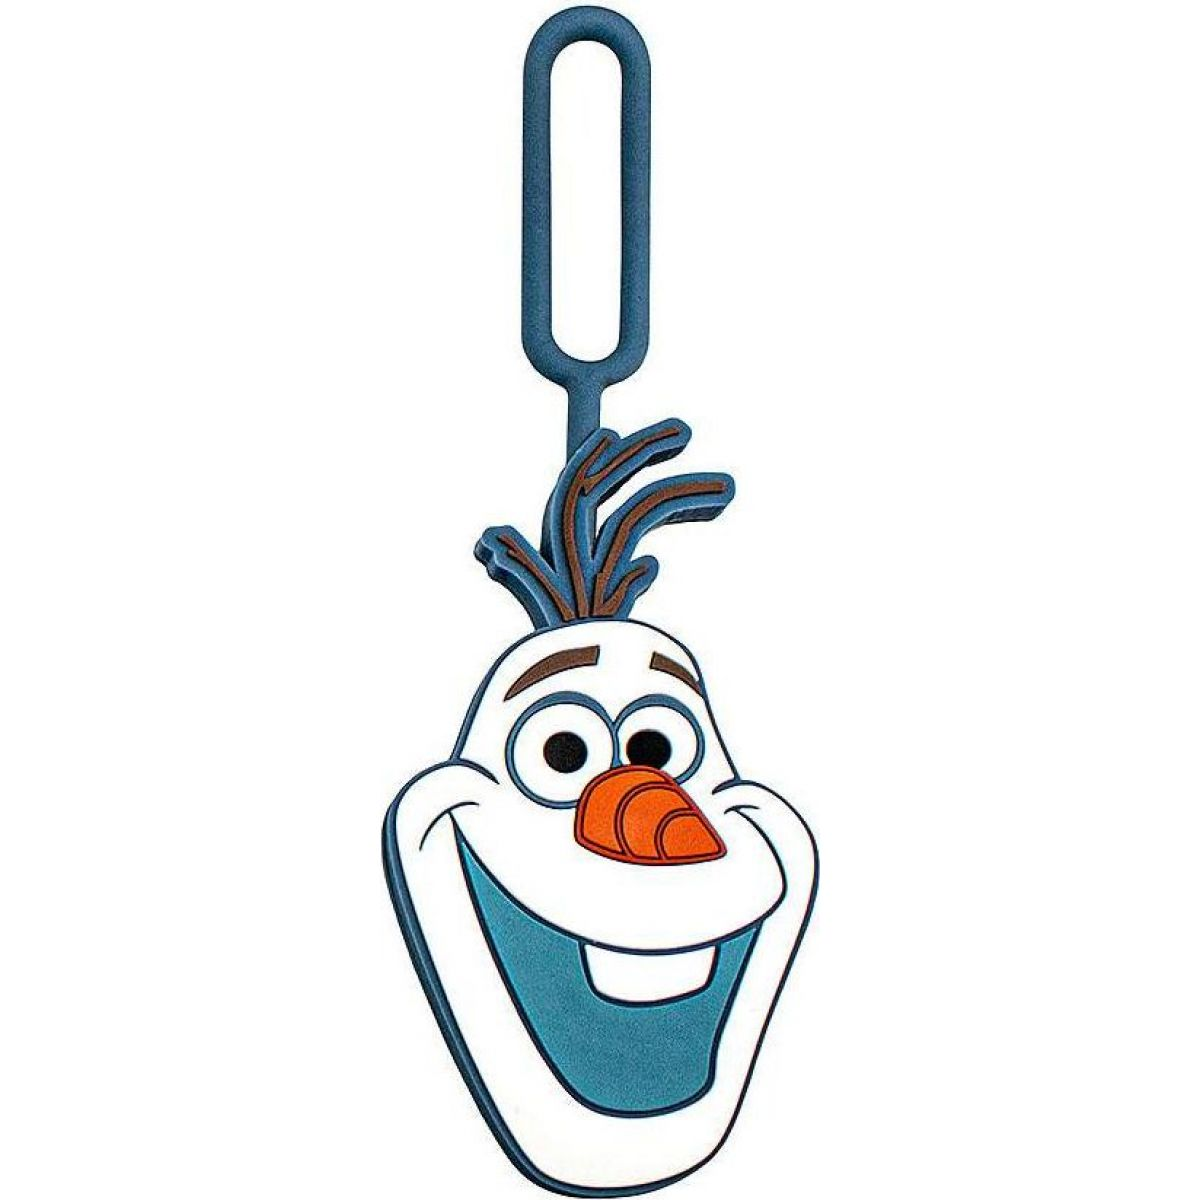 Epee Merch Visačka na kufr Frozen Olaf